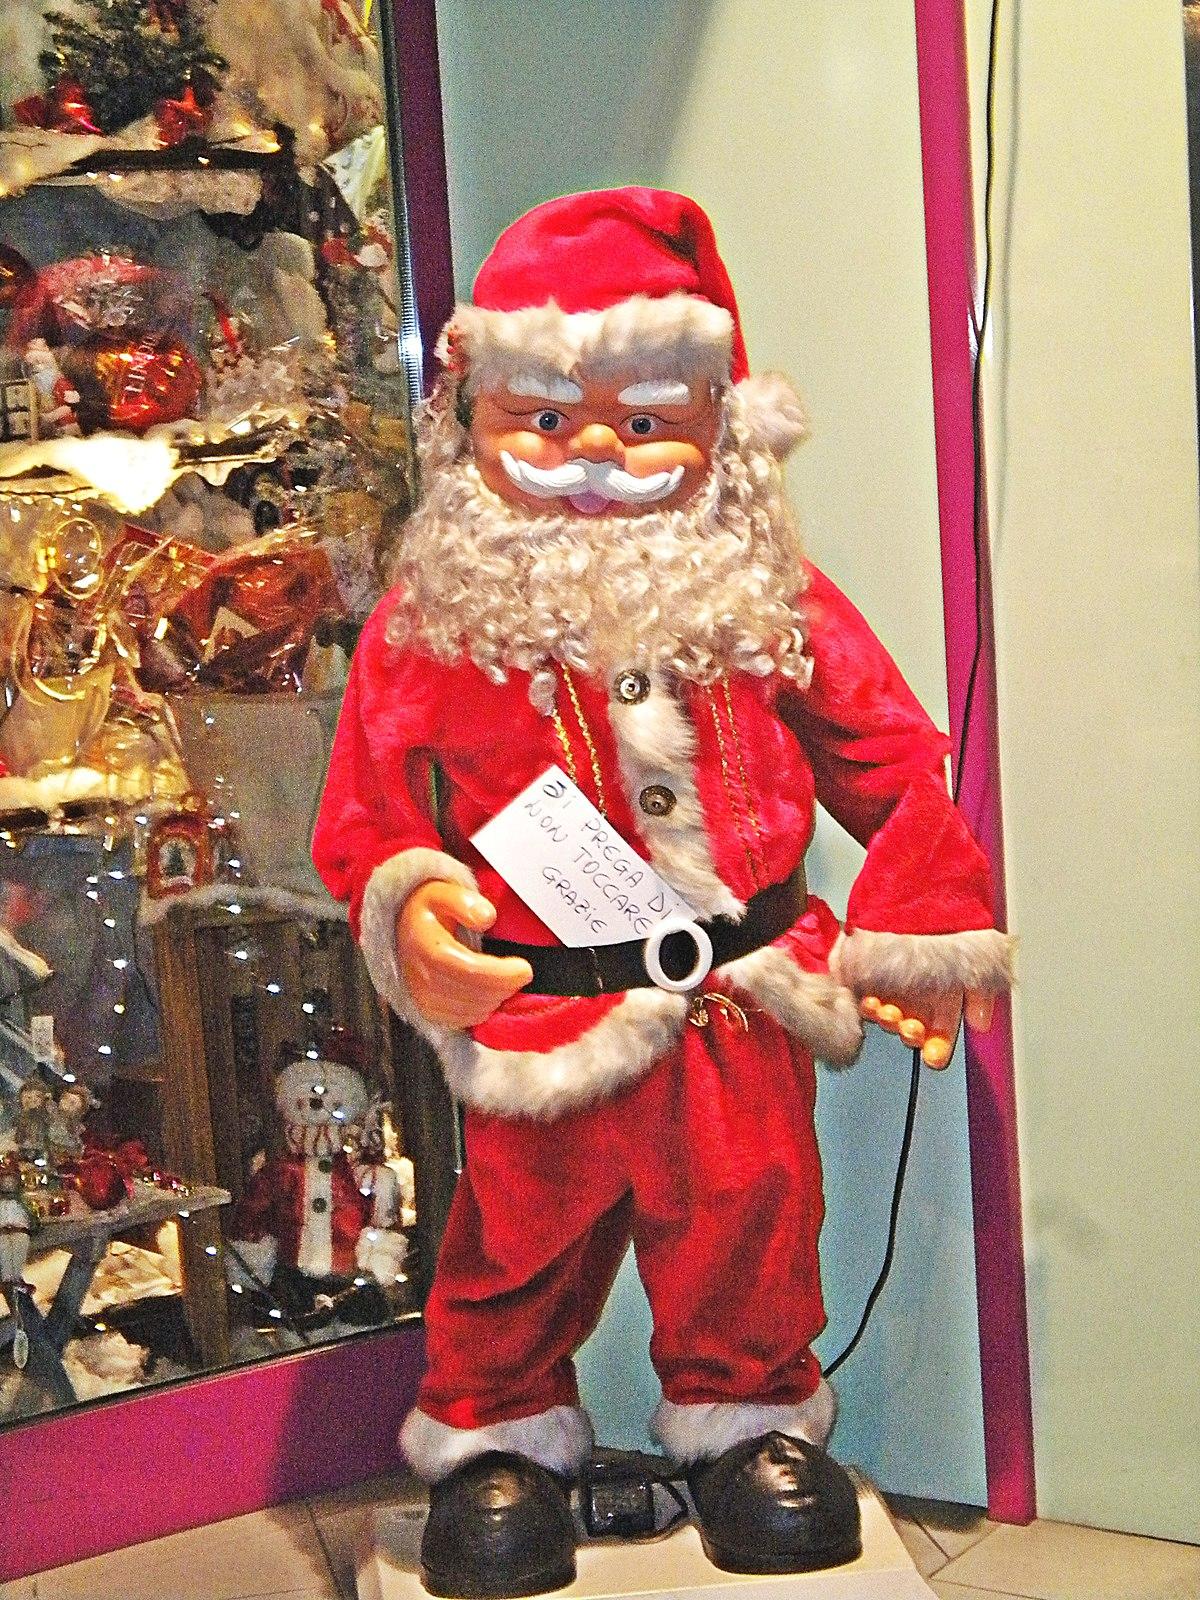 Babbo Natale Wikipedia.File Babbo Natale Movibile Jpg Wikimedia Commons